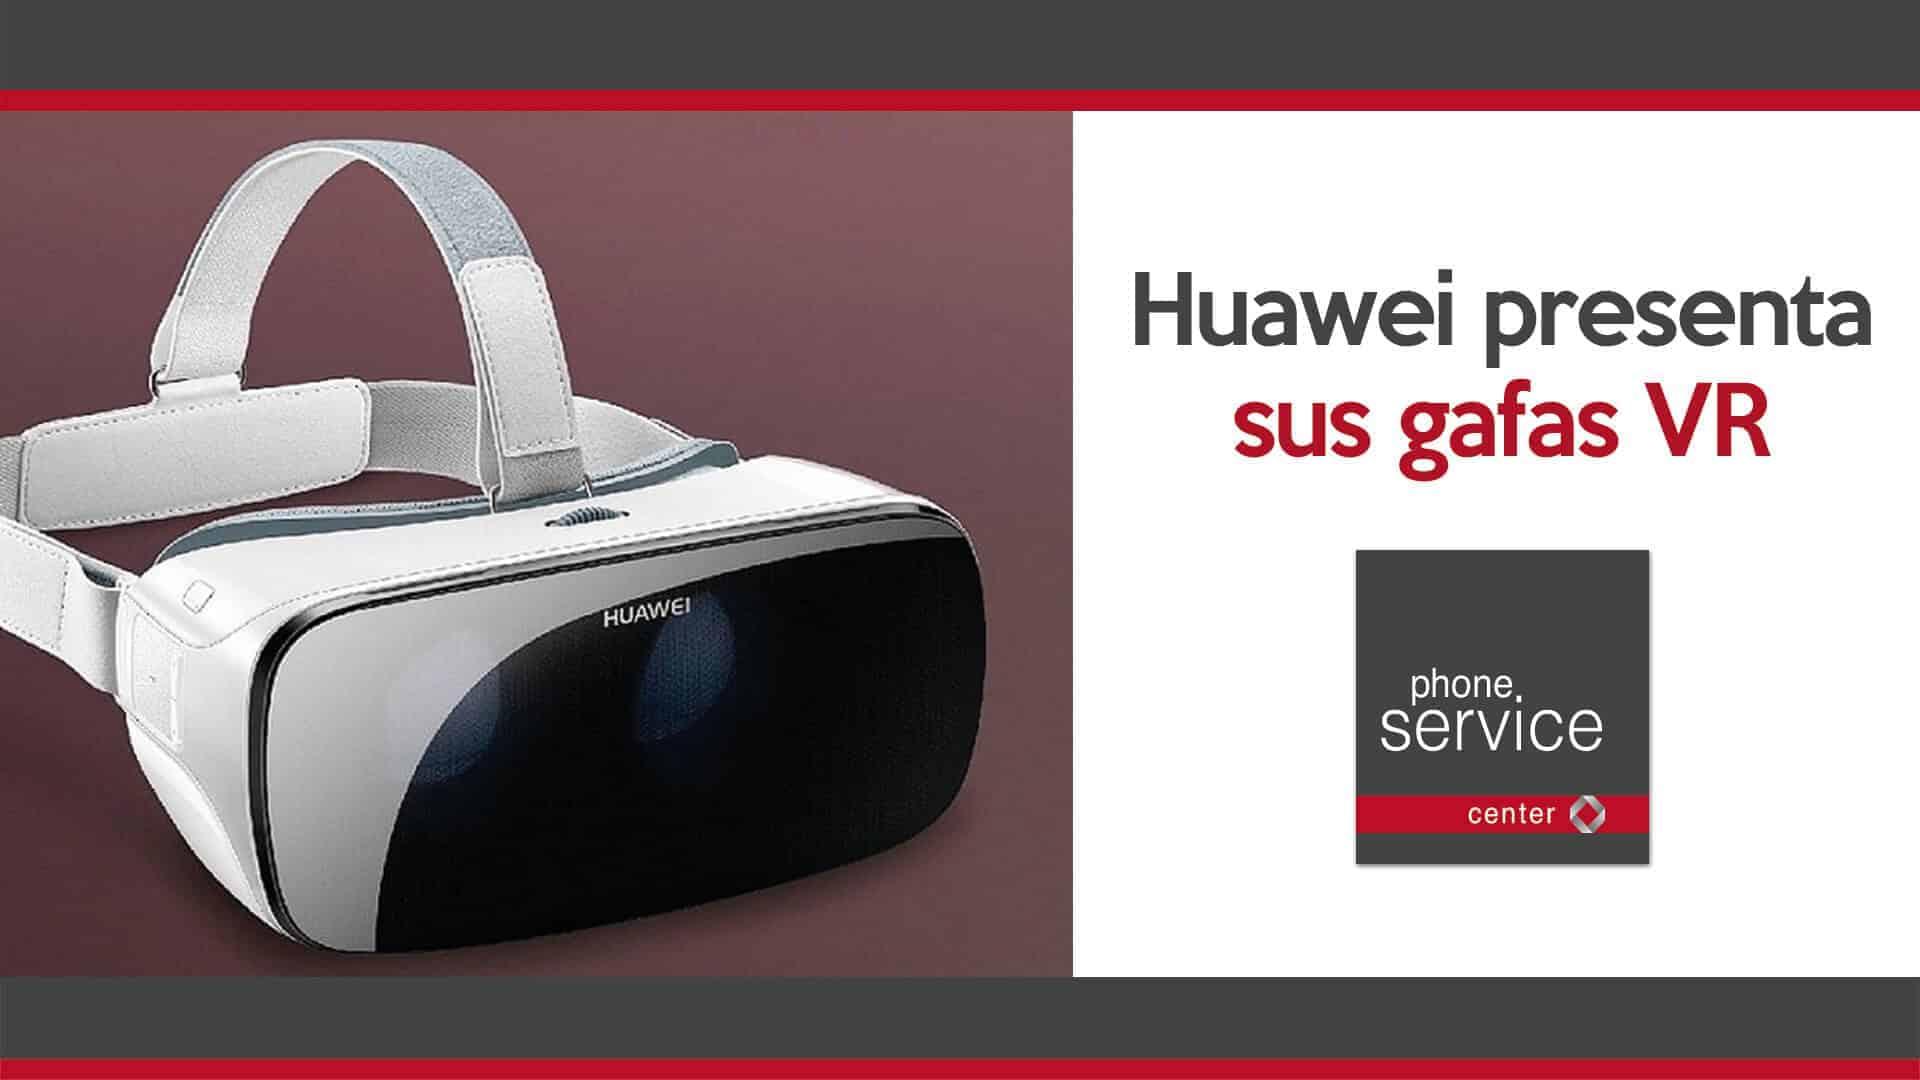 Huawei presenta sus gafas VR